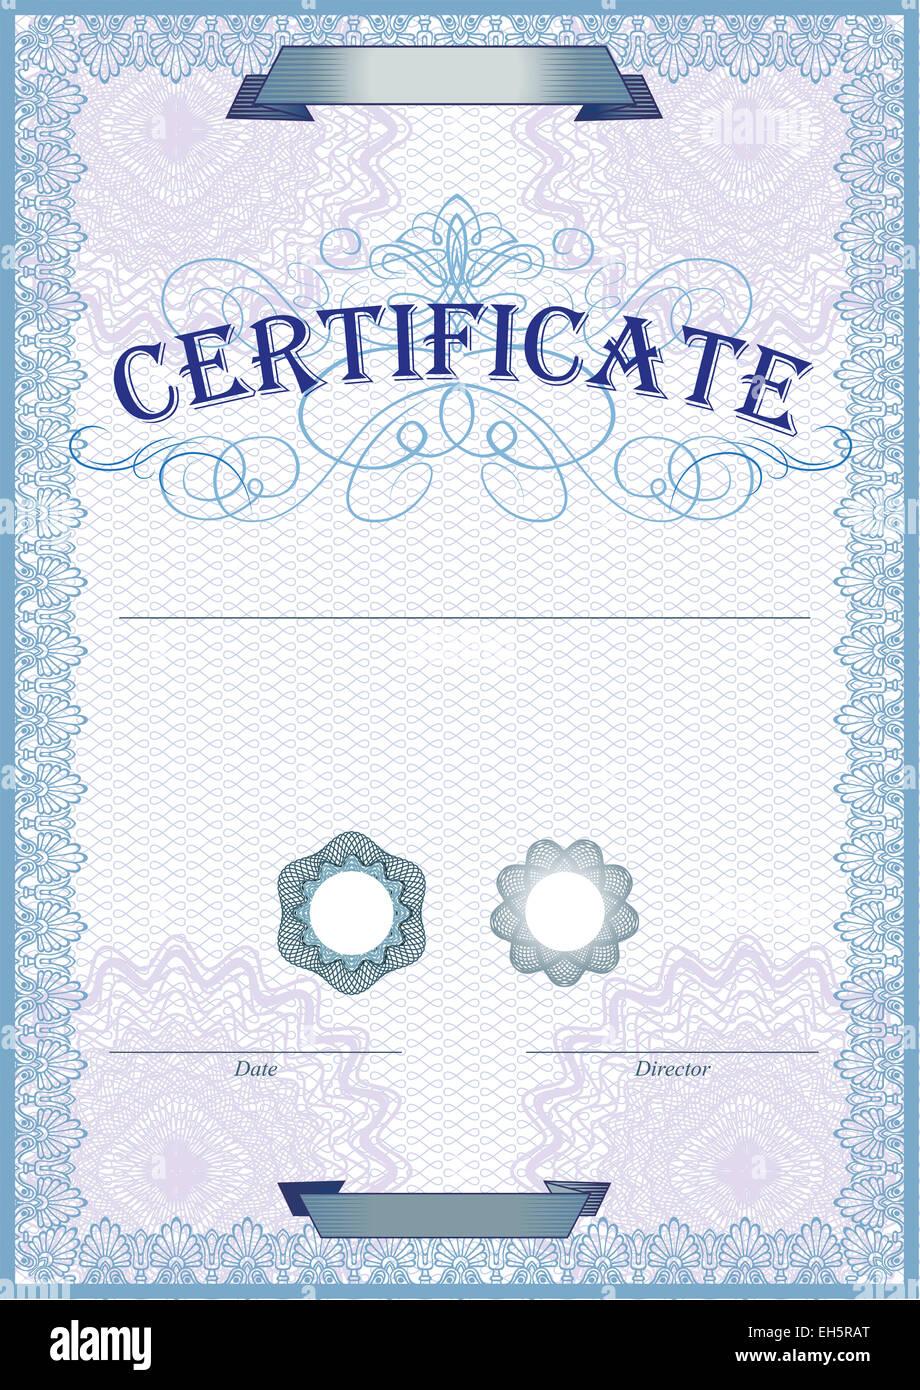 Blue Diploma Stockfotos & Blue Diploma Bilder - Alamy